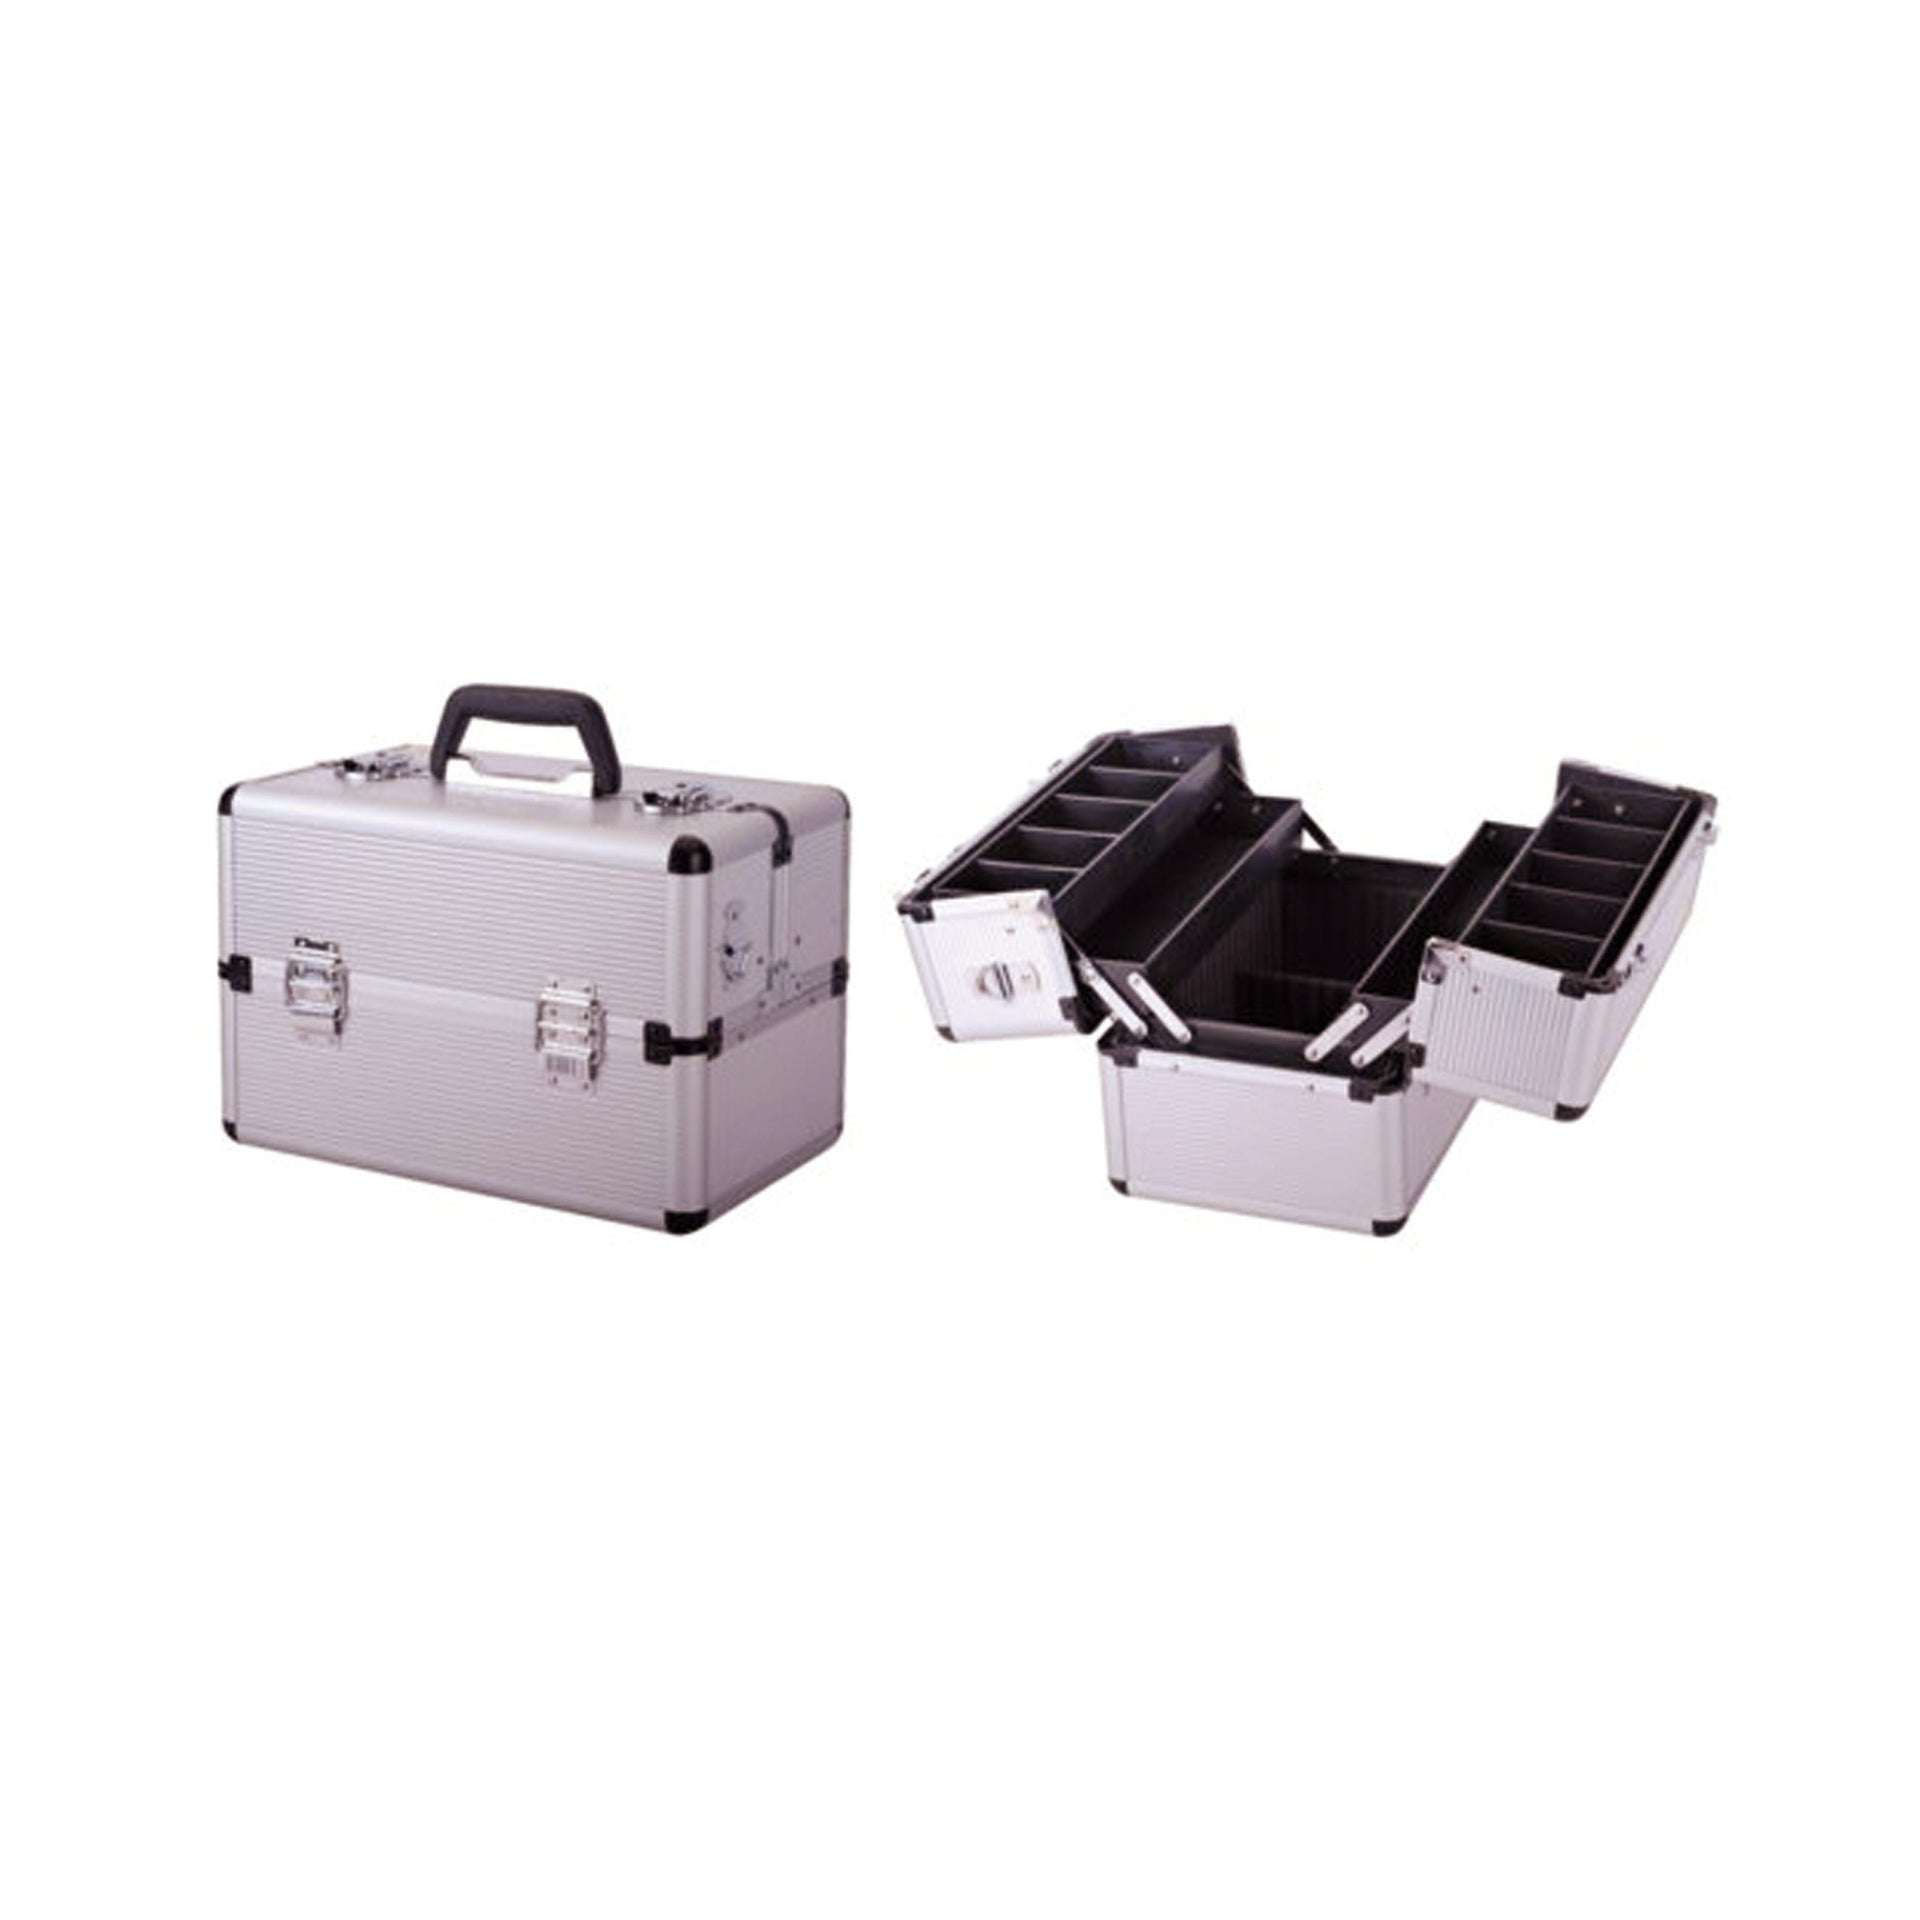 Cassetta attrezzi DEXTER L 22.5 x H 36.5 cm, profondità 250 mm - 1